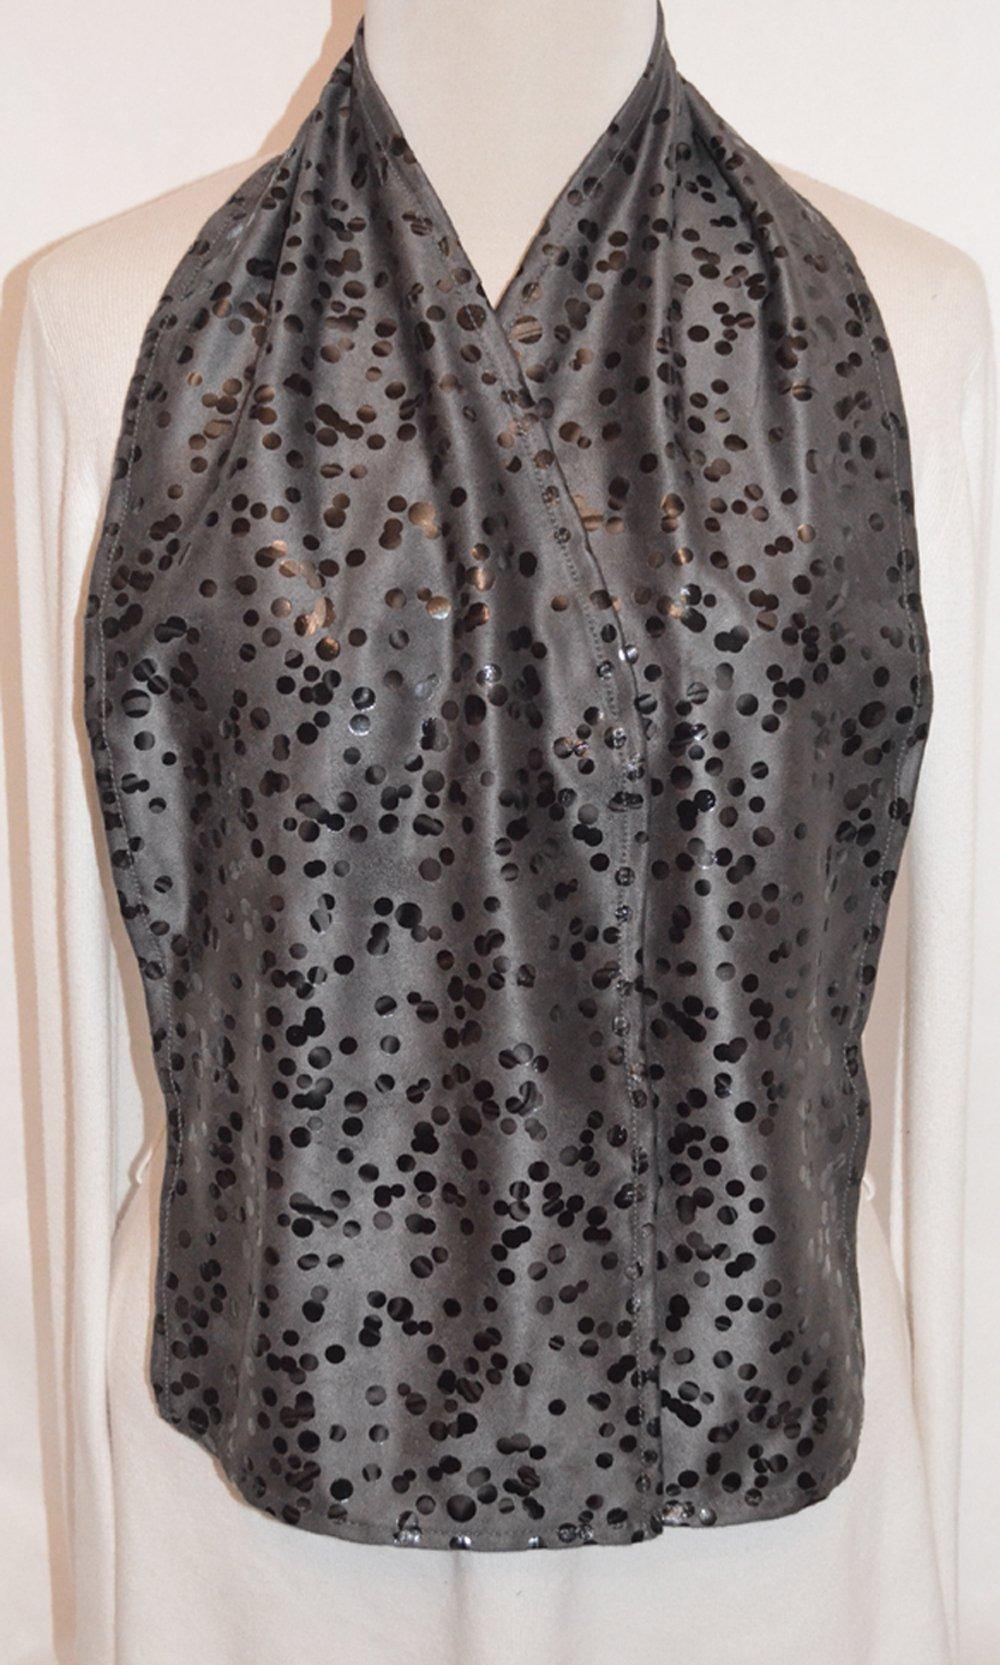 DinerWear Cravaat - Fashionable Adult Bib Dining Scarf (Black Dot)